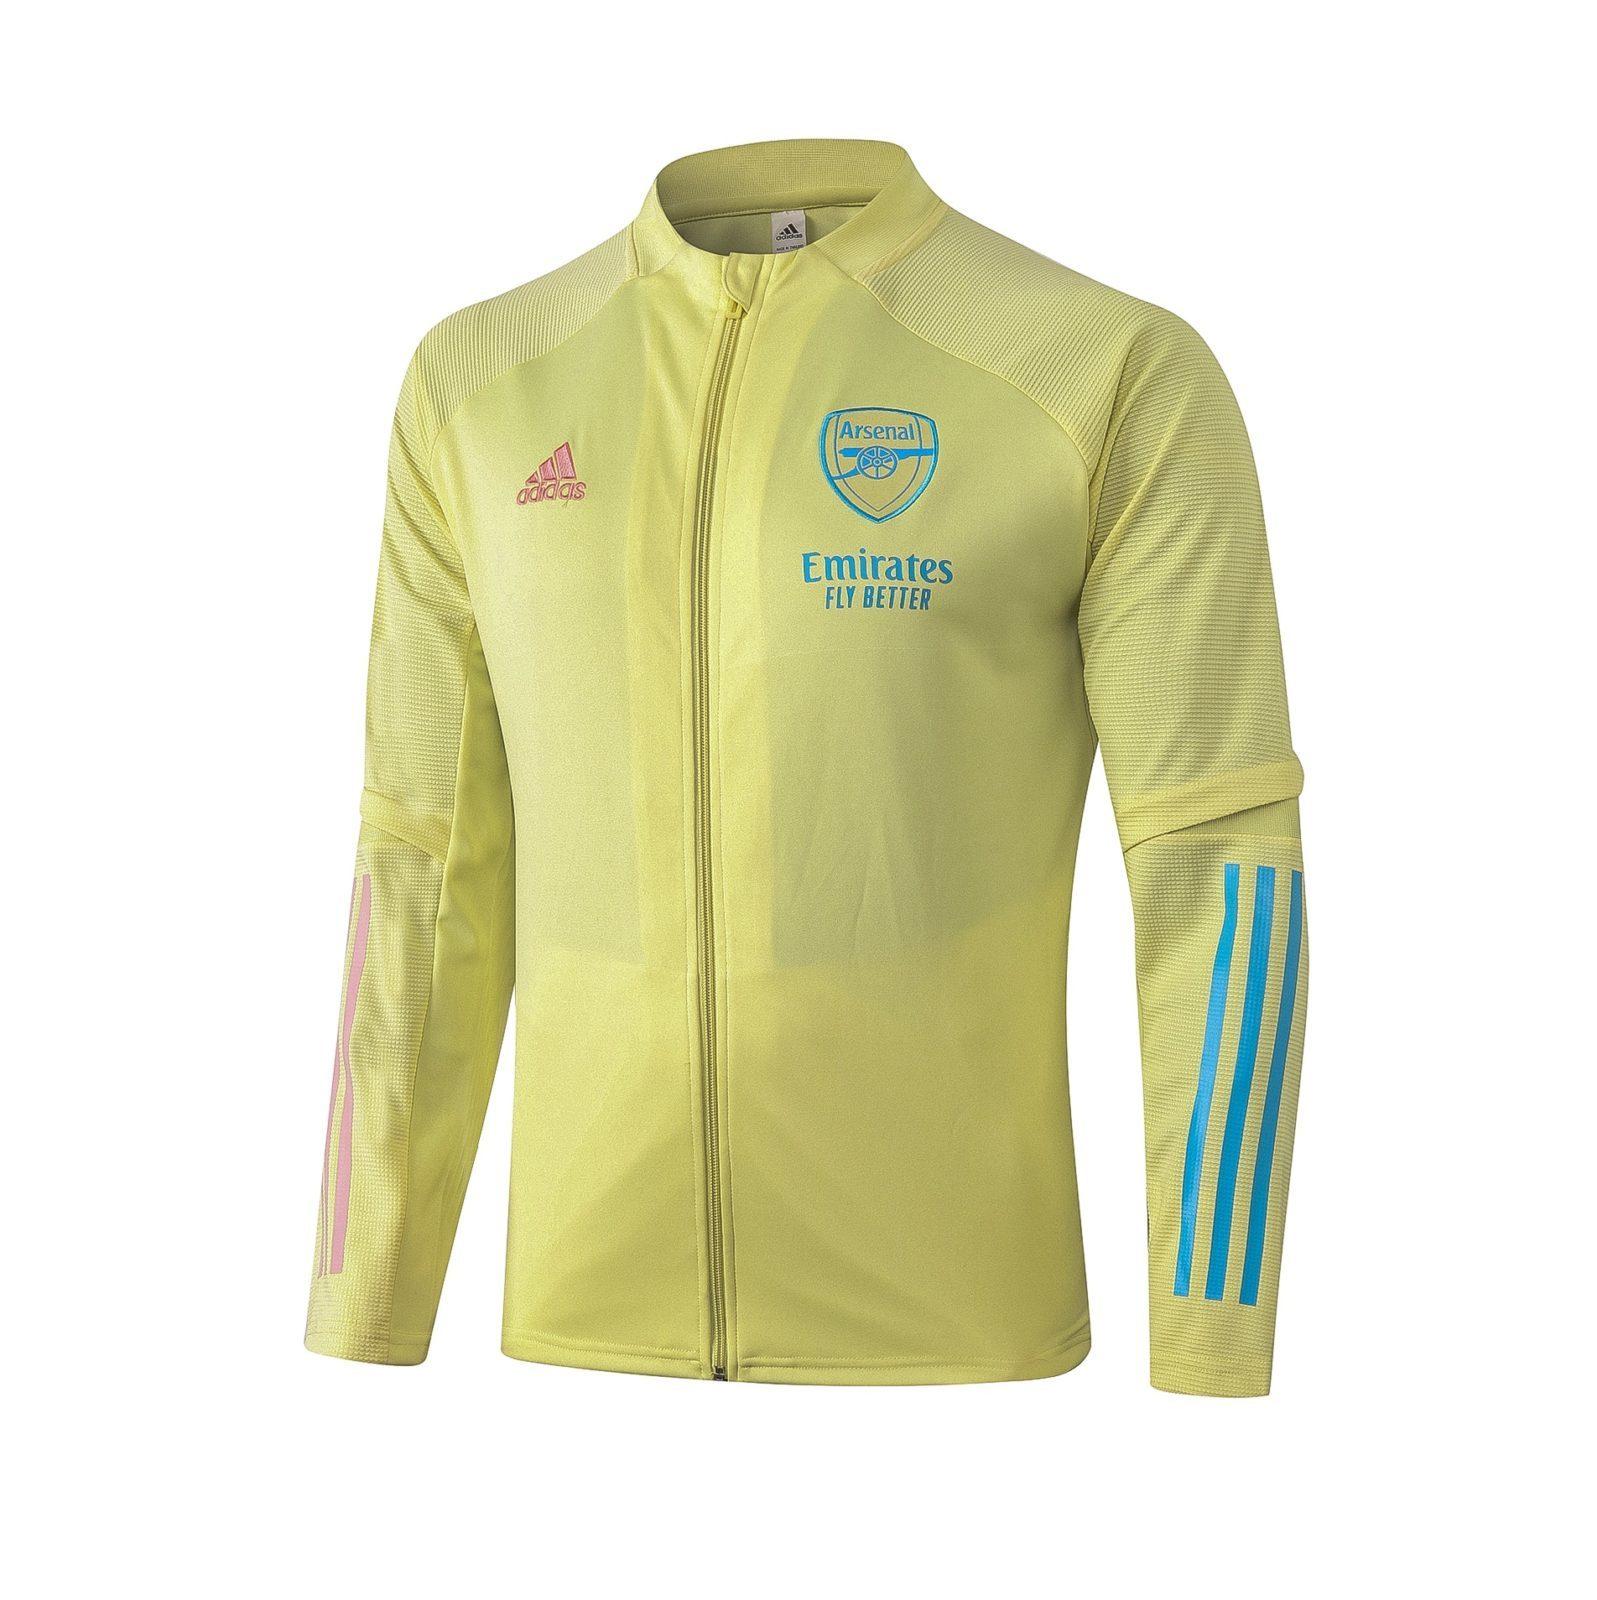 Олимпийка Арсенала сезон 2020-2021 (Жёлтая)